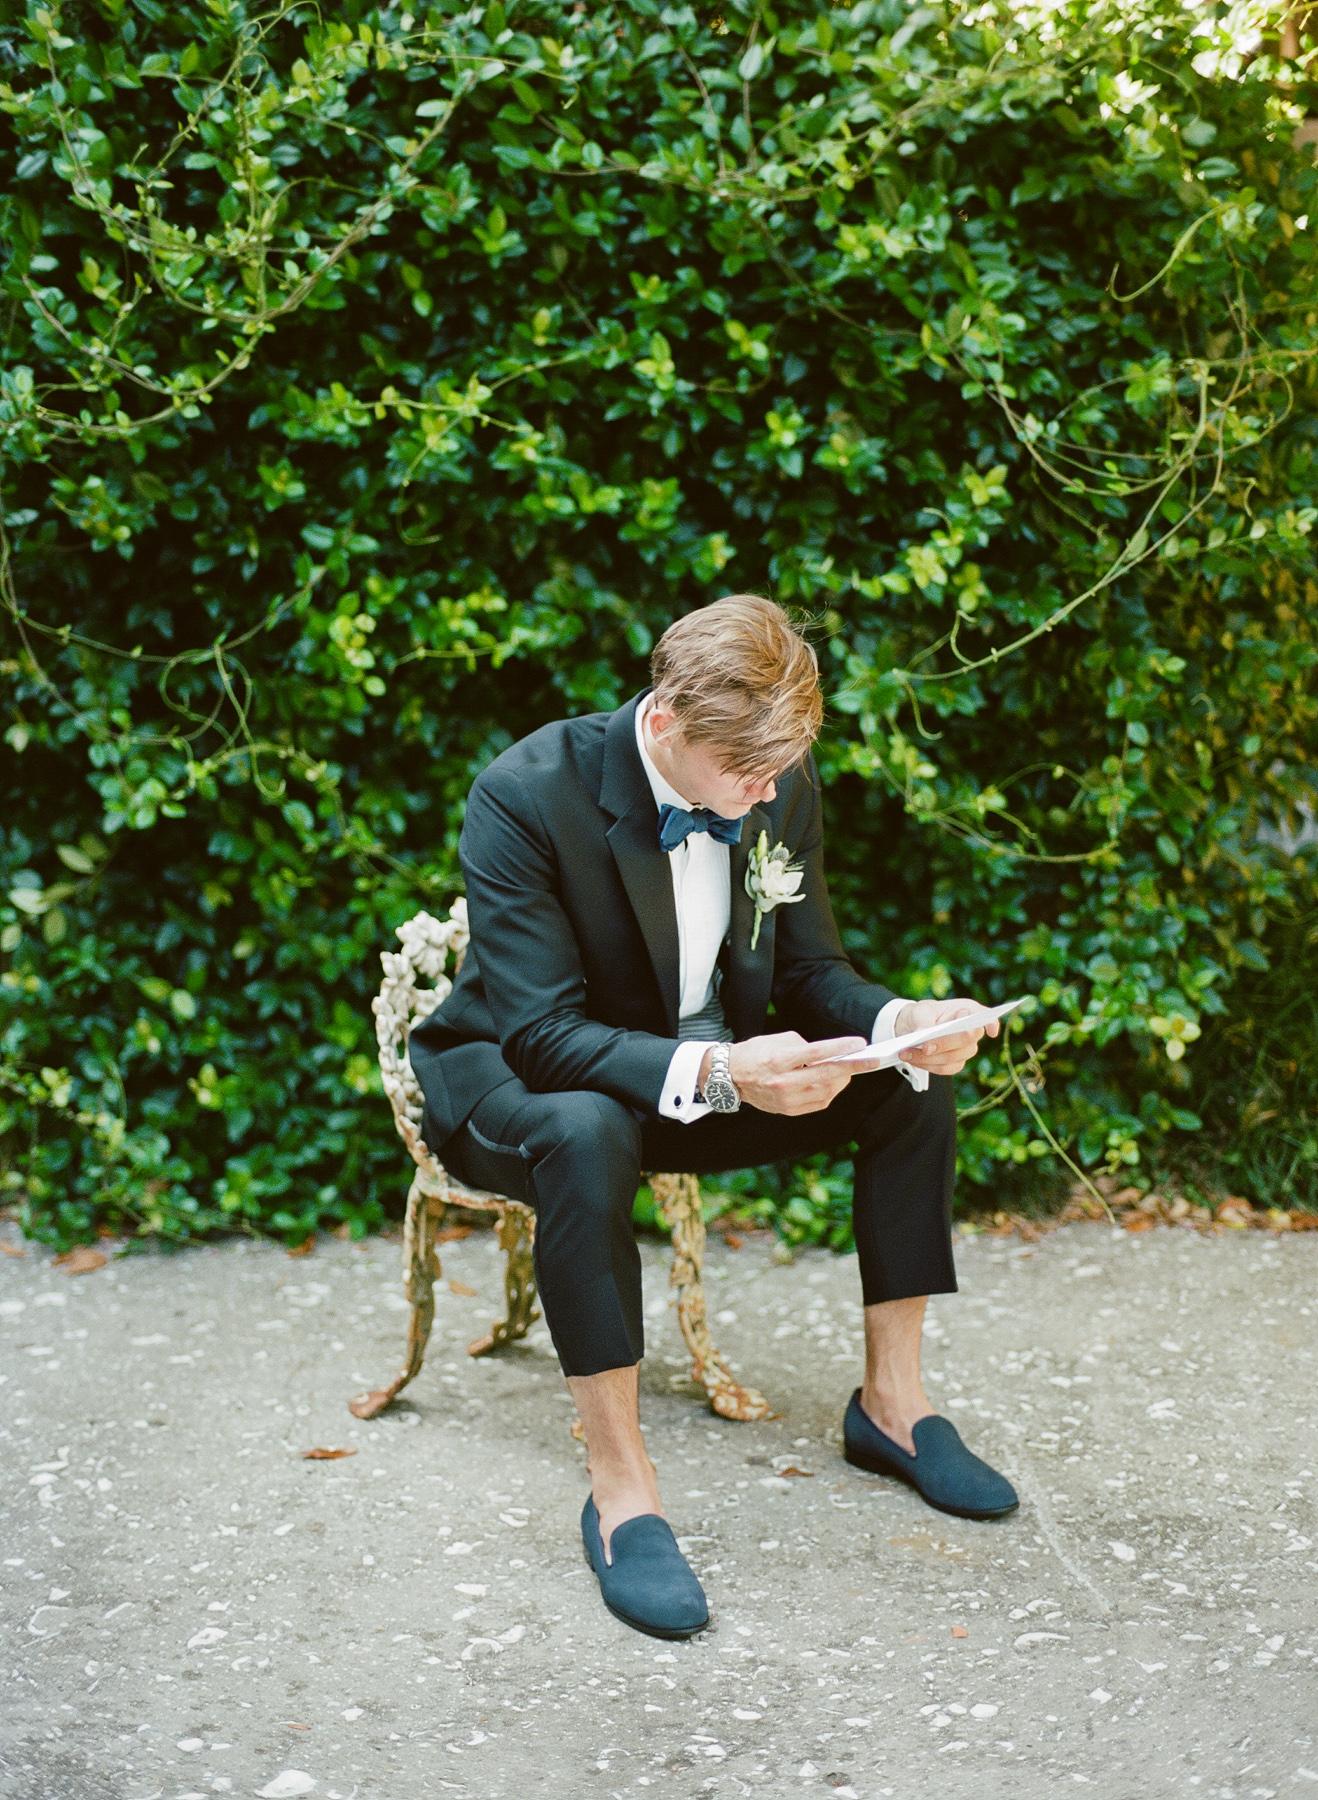 NC-wedding-venues-film-photographer-13.jpg